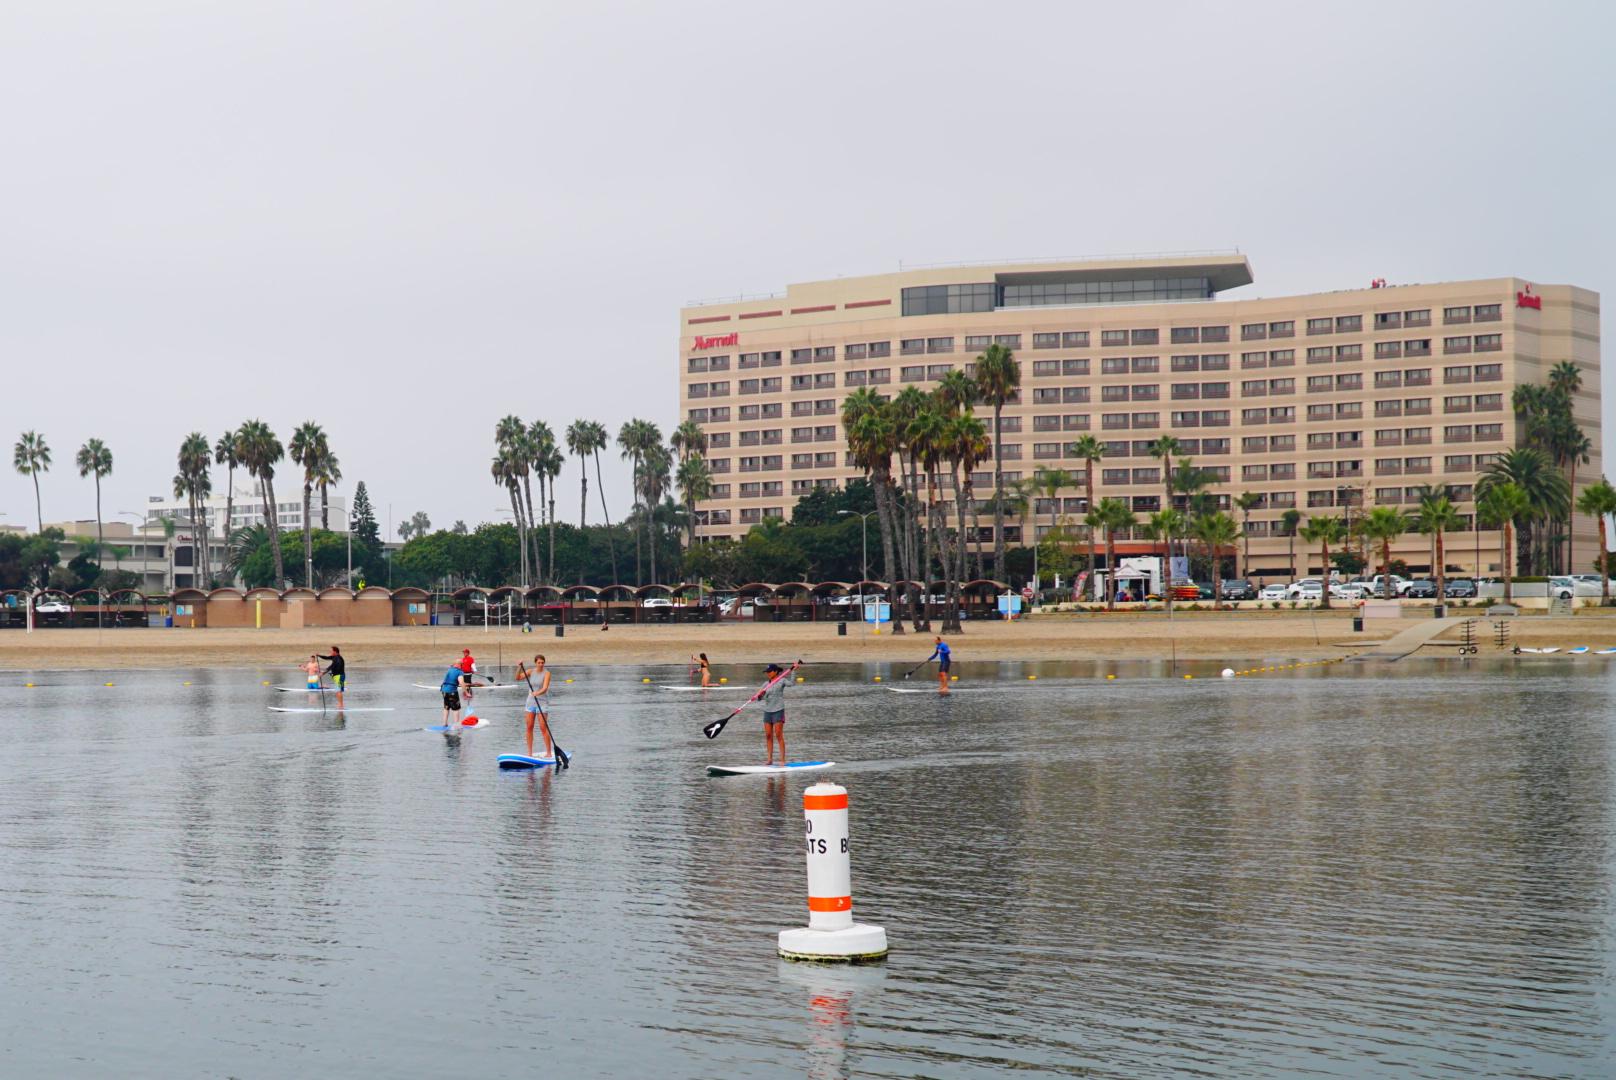 Thumbnail image for Weekend Getaways in Marina del Rey